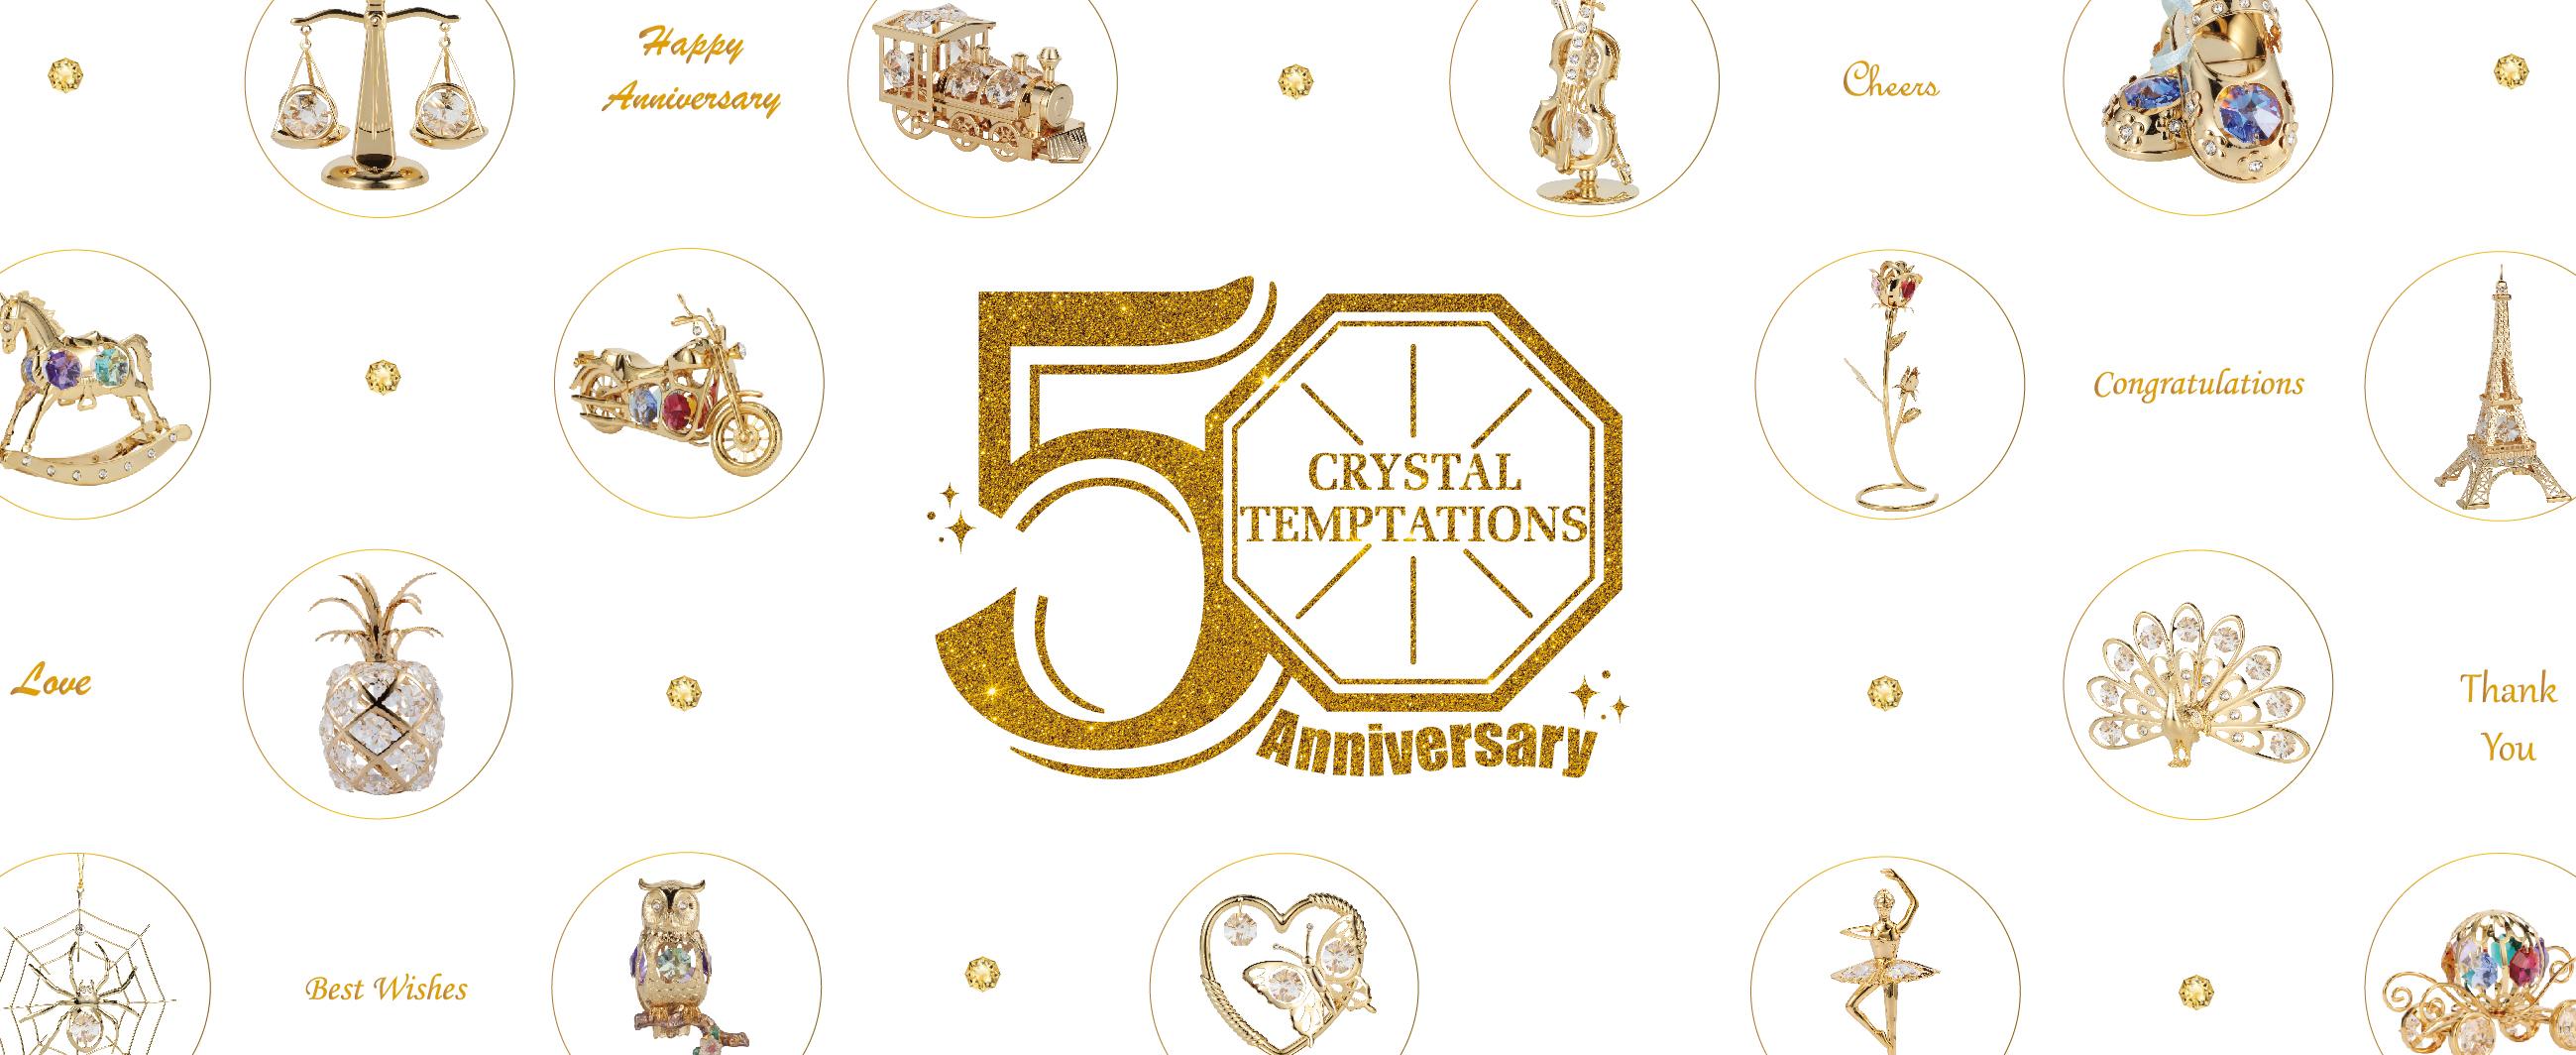 Milestones: 50 Years of Success